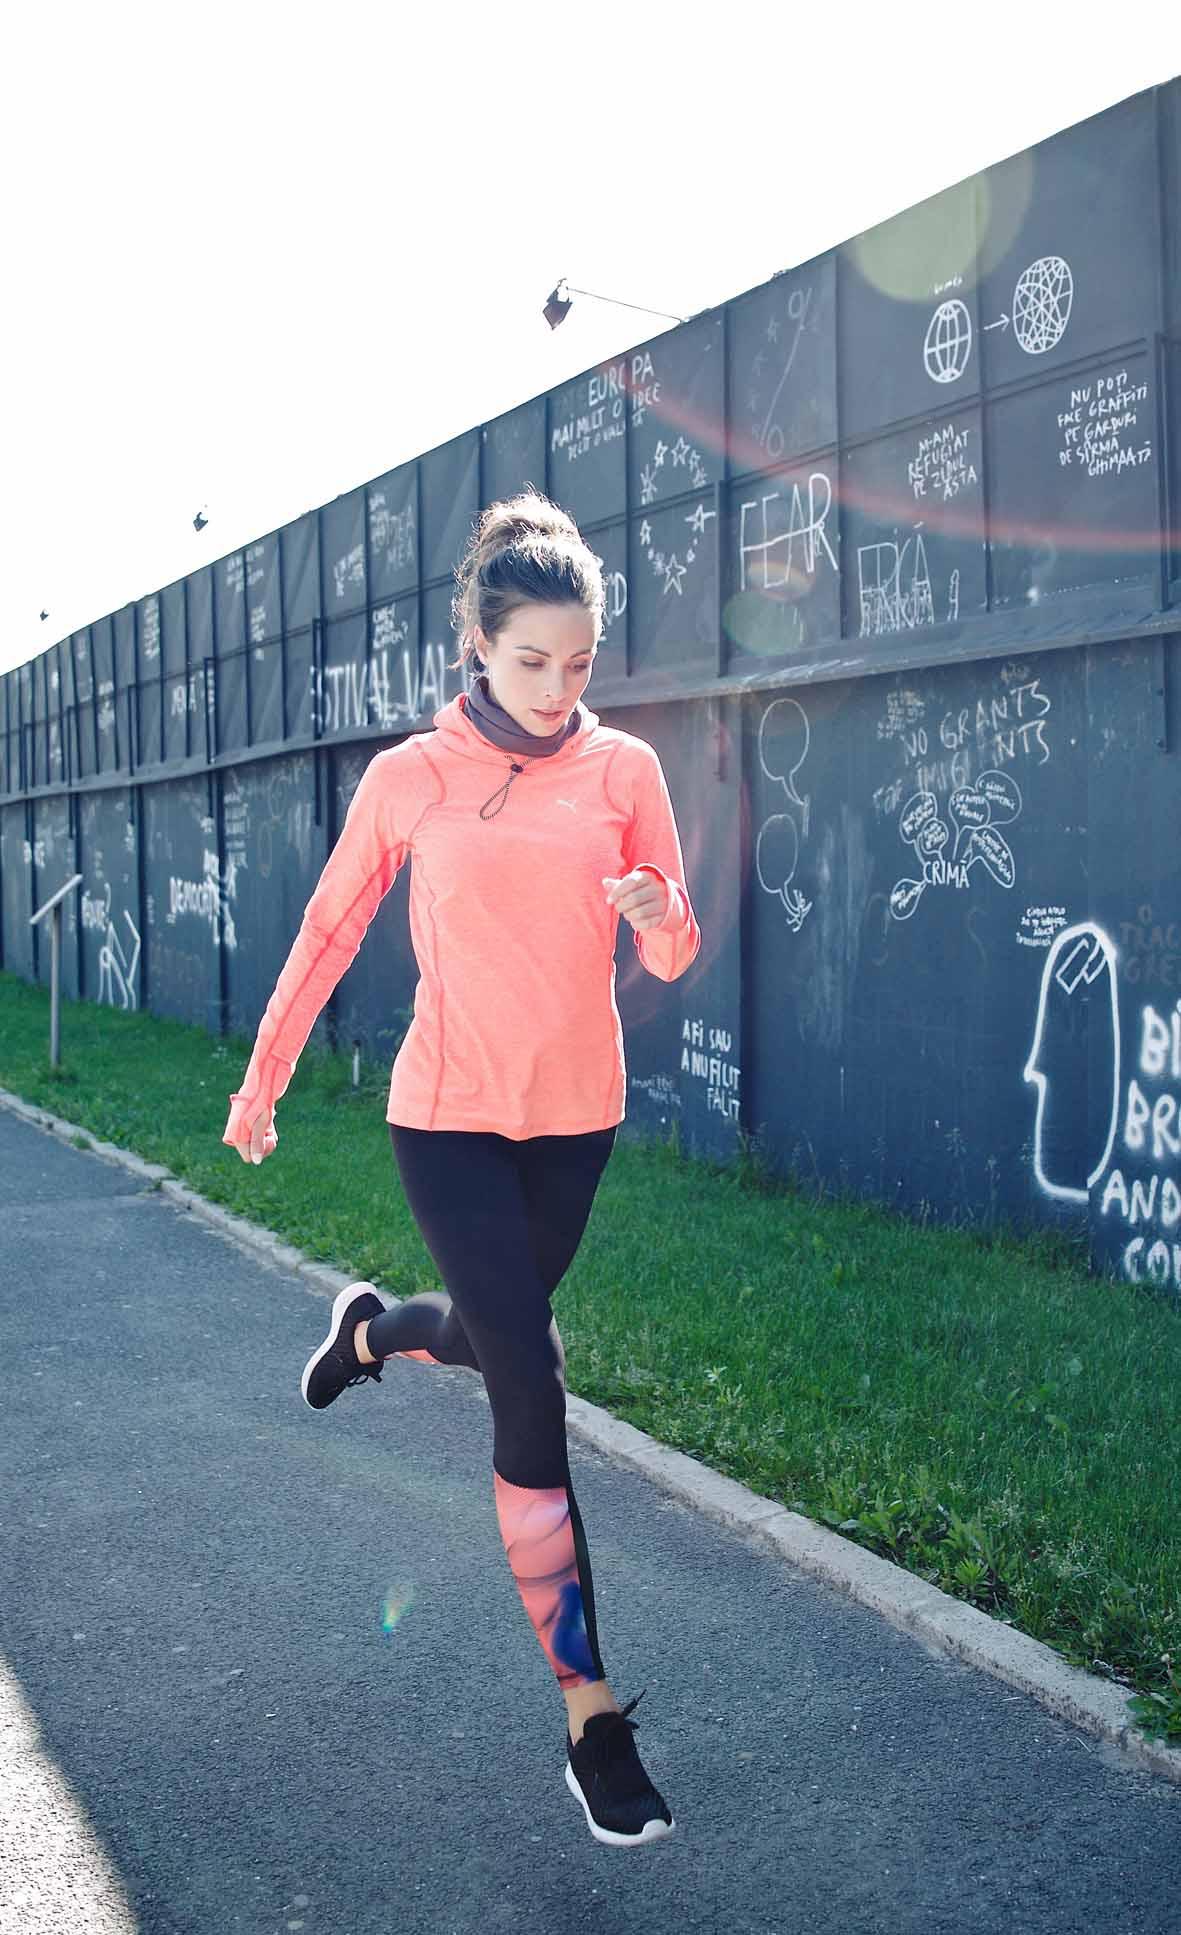 Nicola sportlich in lachsfarbener Trainingsjacke